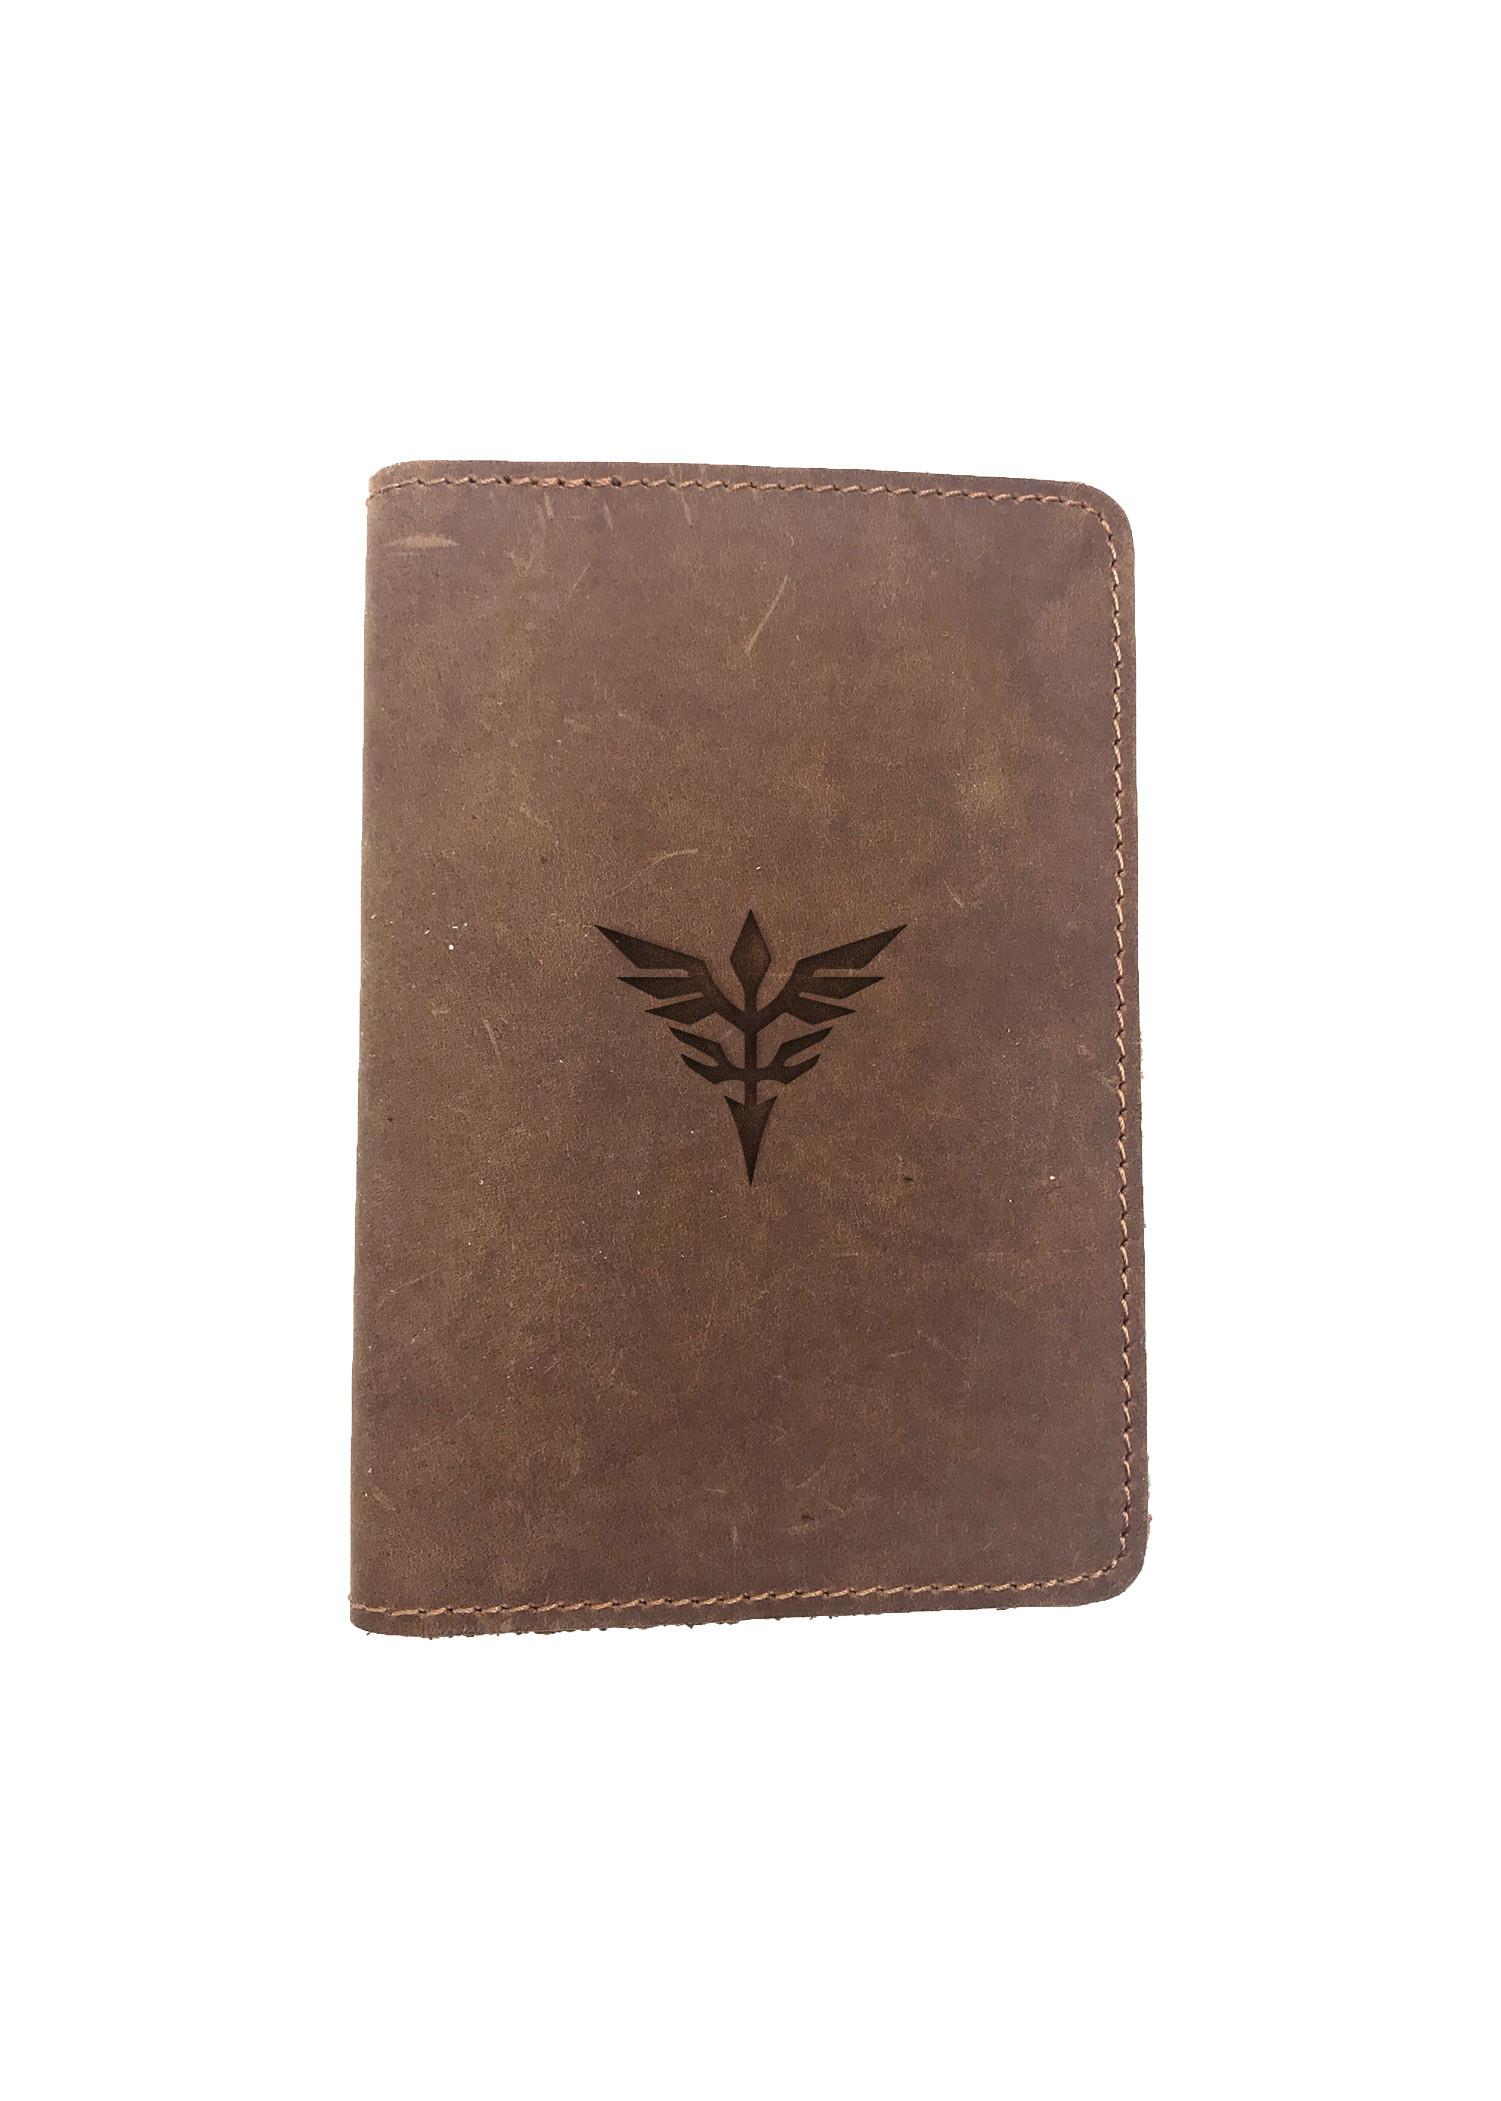 Passport Cover Bao Da Hộ Chiếu Da Sáp Khắc Hình Hình GUNDAM (BROWN)